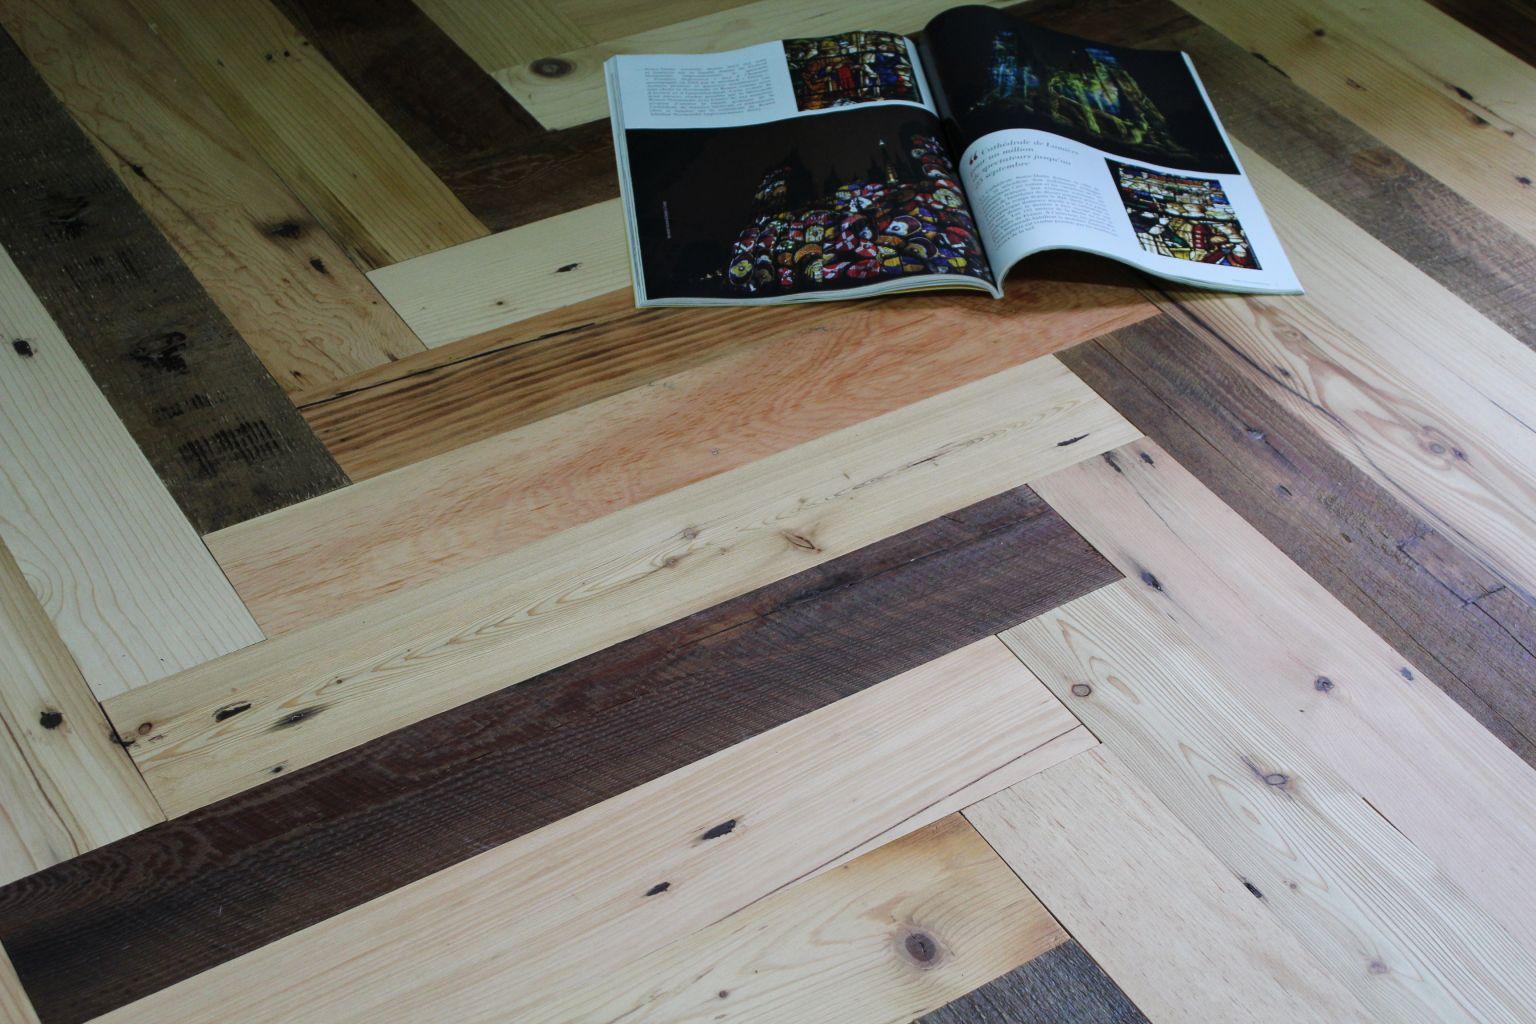 parquet vieux sapin en b ton rompu contrecoll bca mat riaux anciens. Black Bedroom Furniture Sets. Home Design Ideas